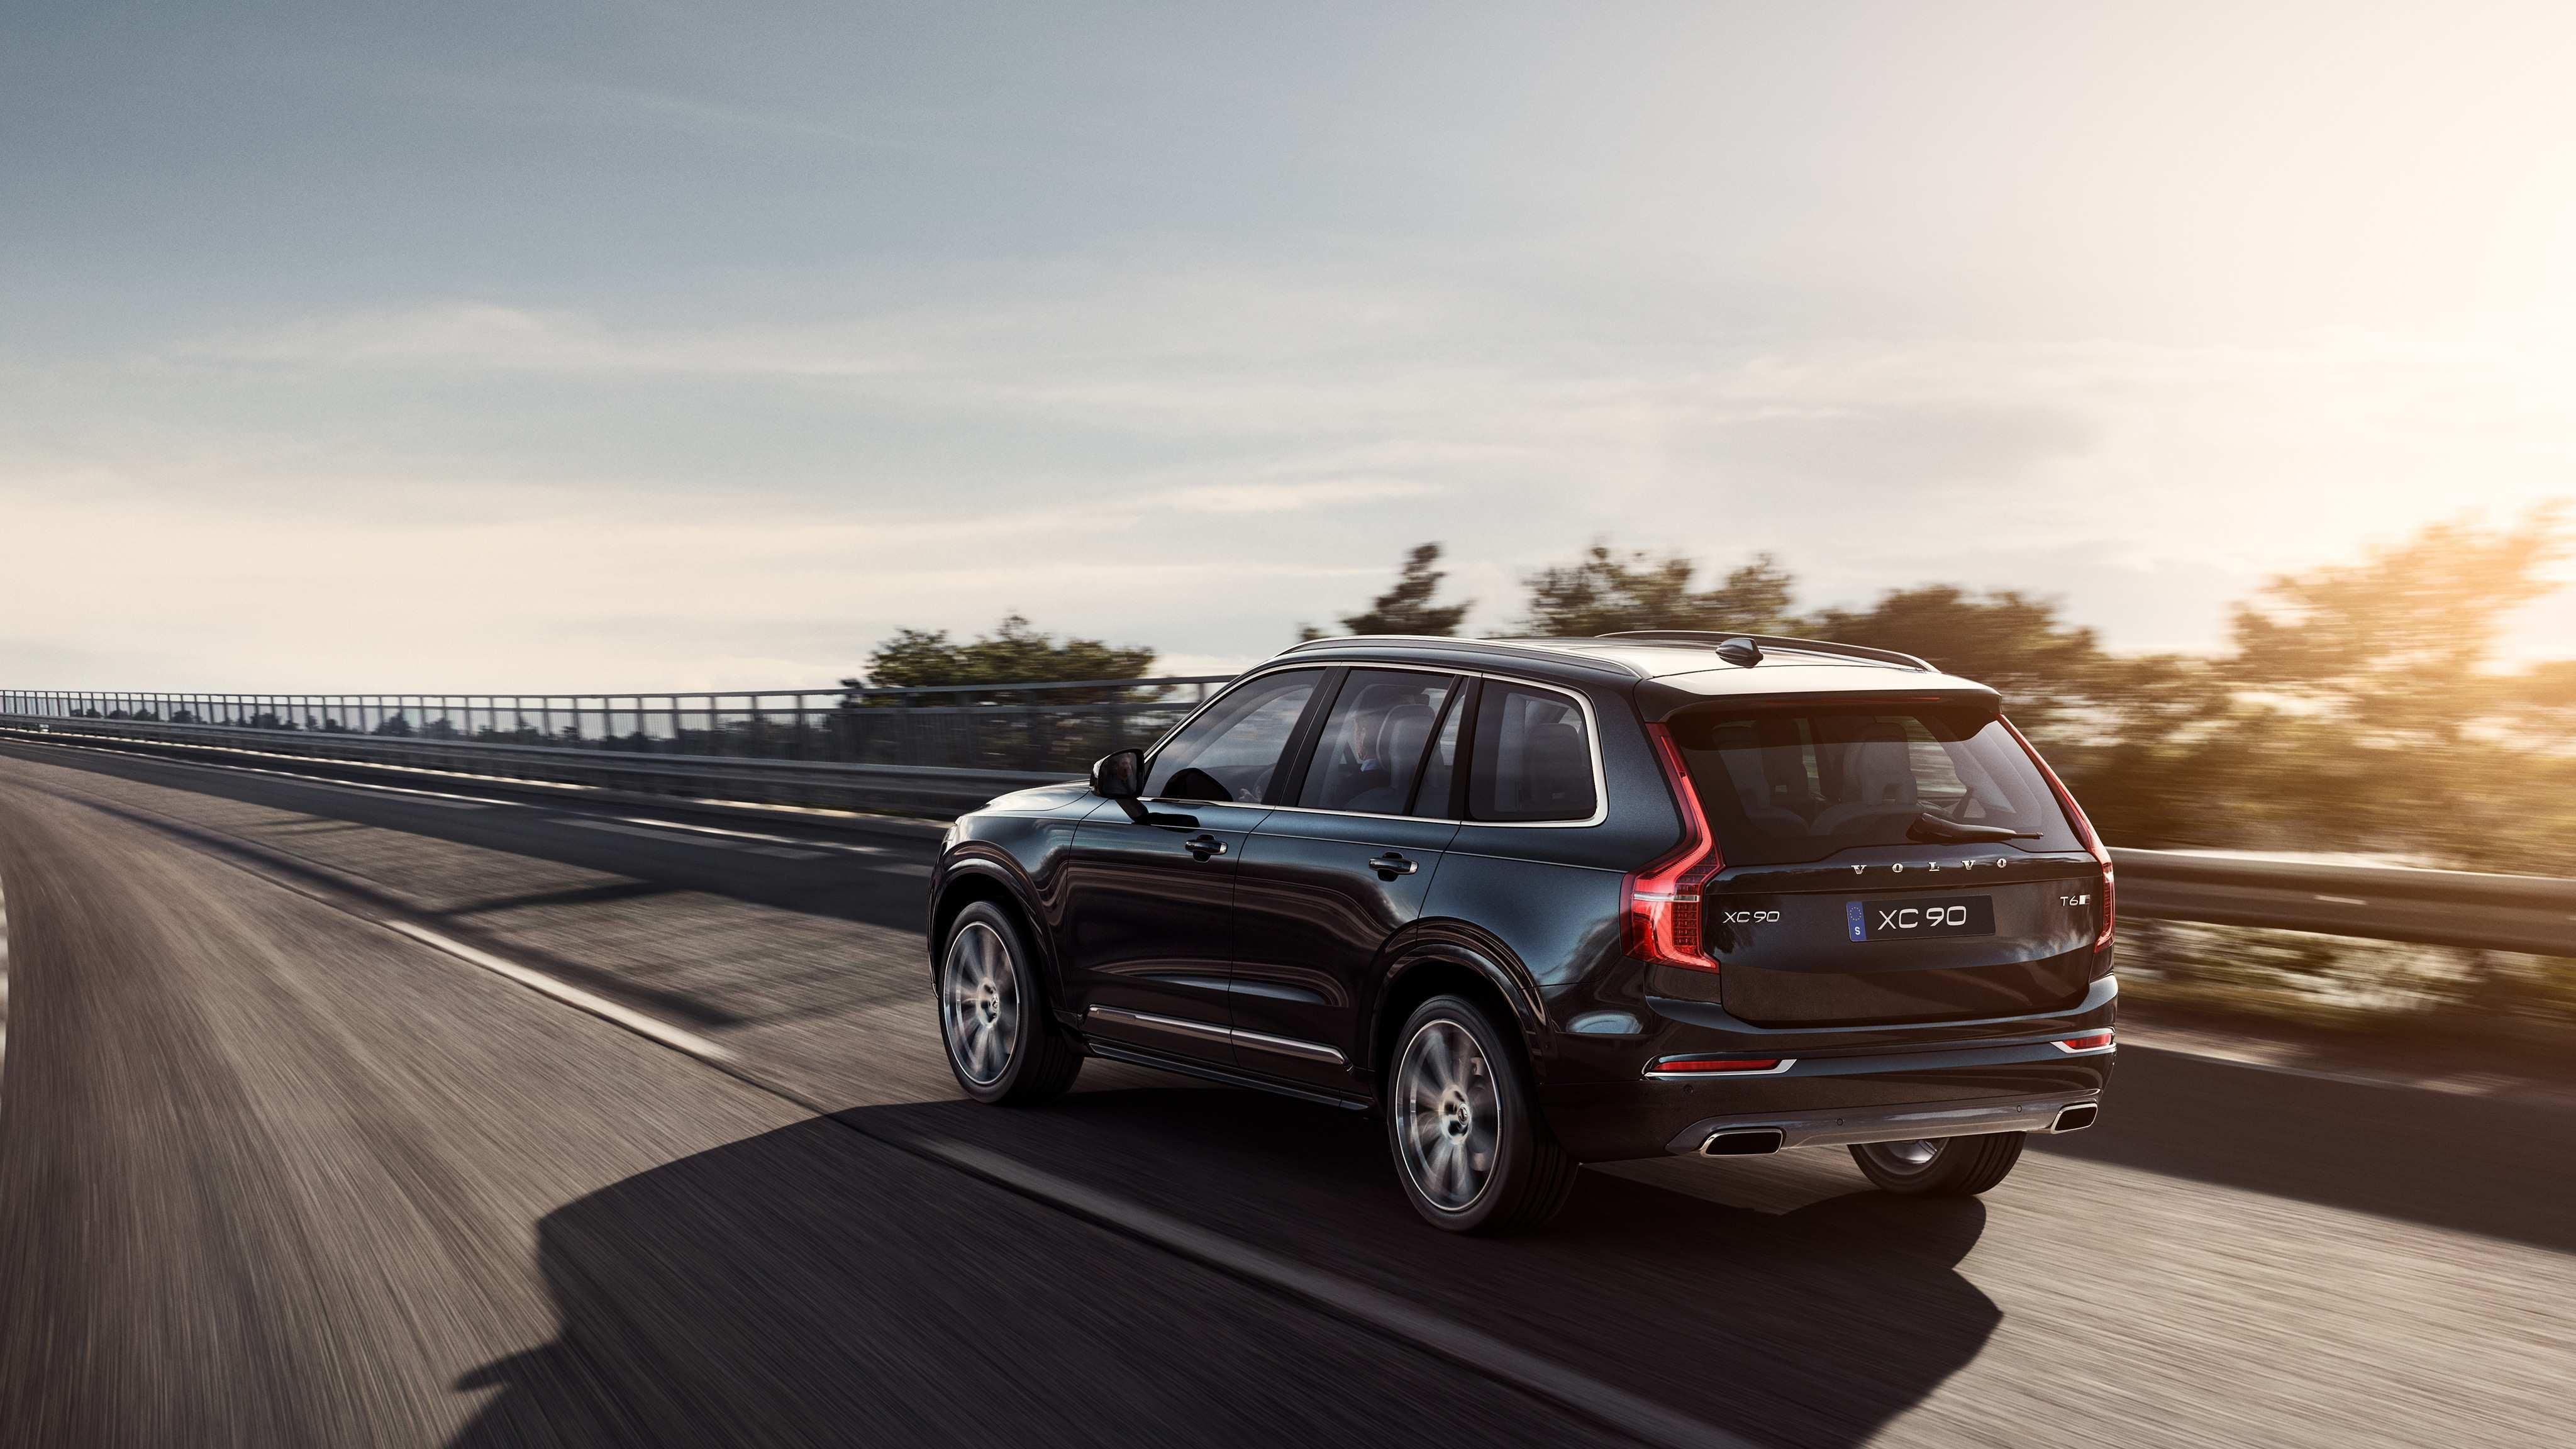 13 Concept of Volvo Bis 2020 Interior by Volvo Bis 2020